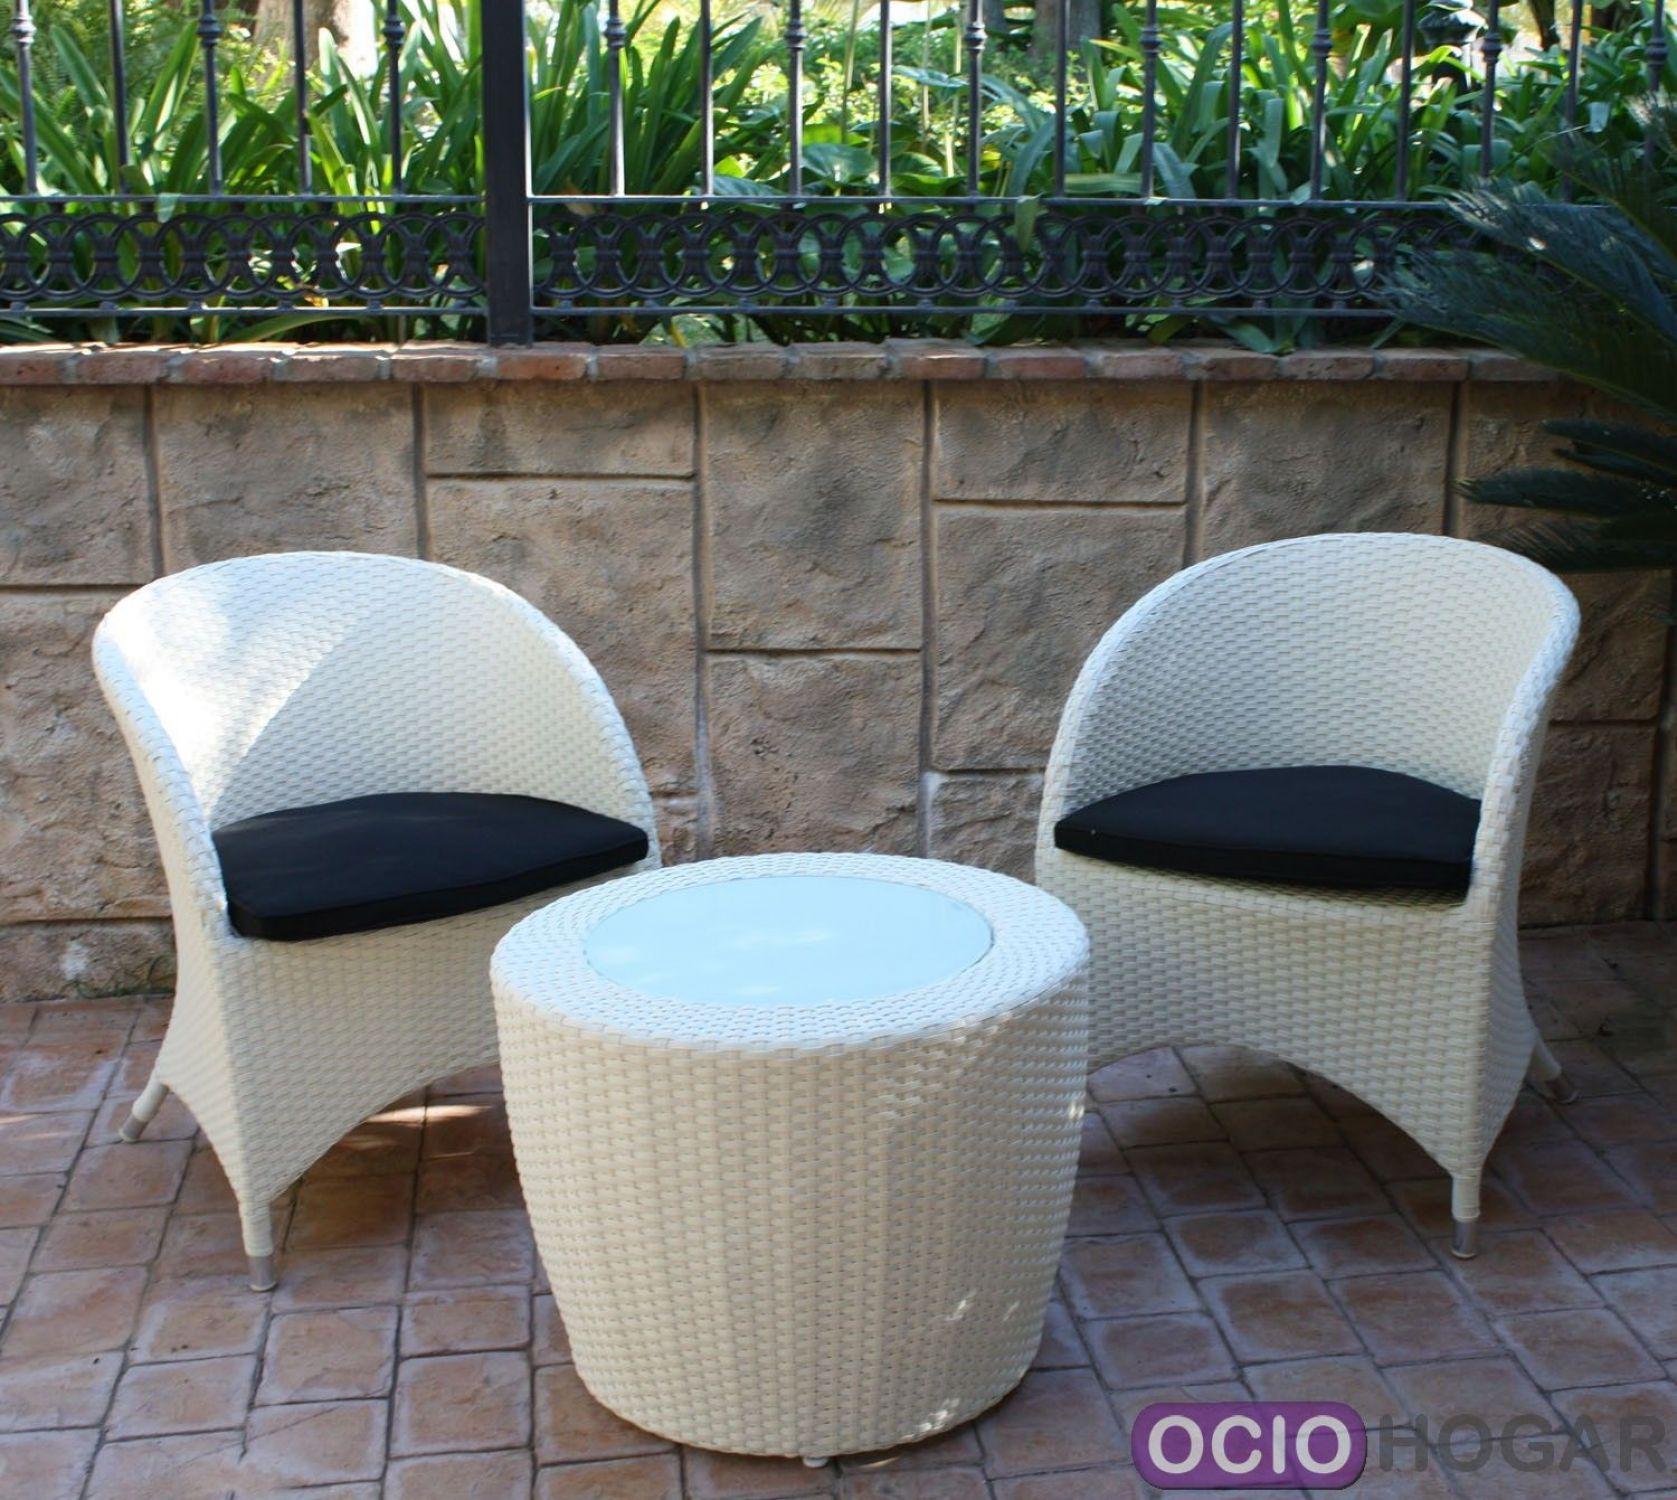 Set de sillones y mesa de exterior lotus white de majestic for Sillones de exterior